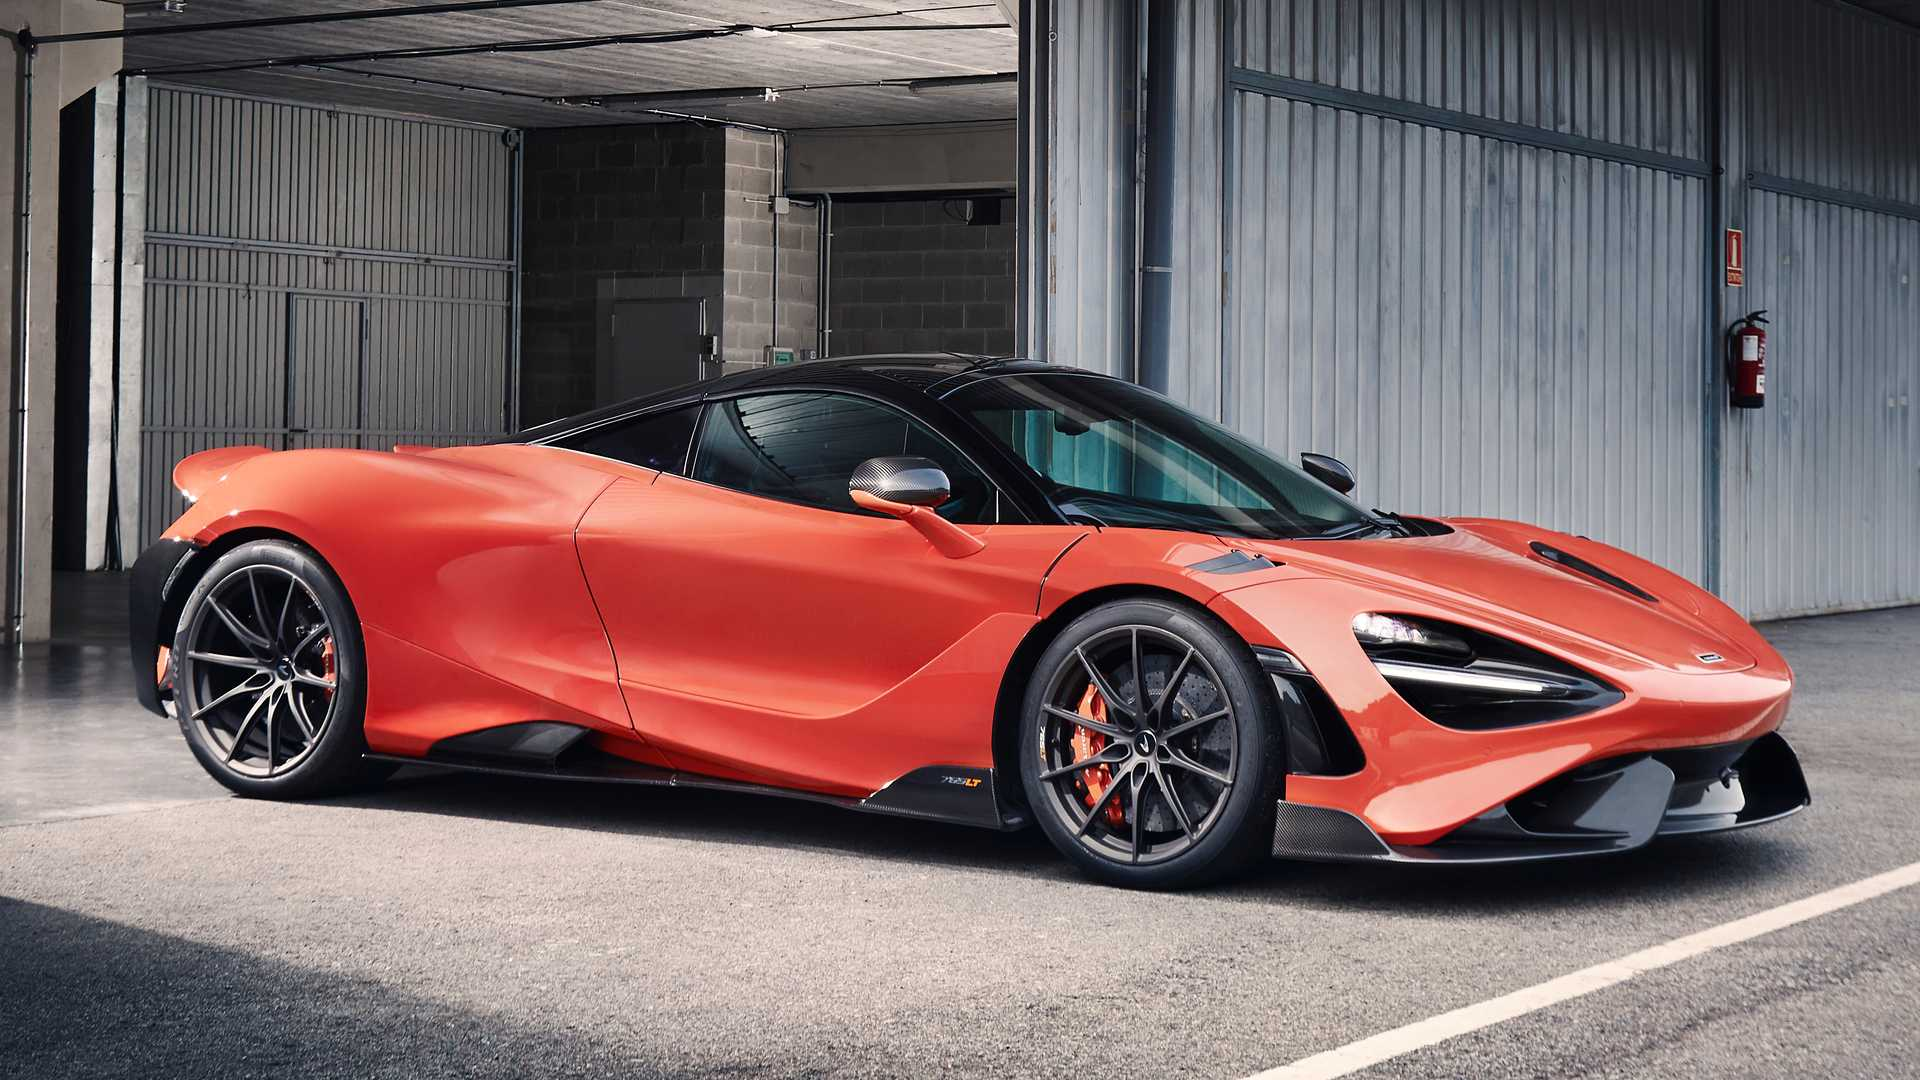 McLaren Getting $185.7M In Funding From Bahrain Bank